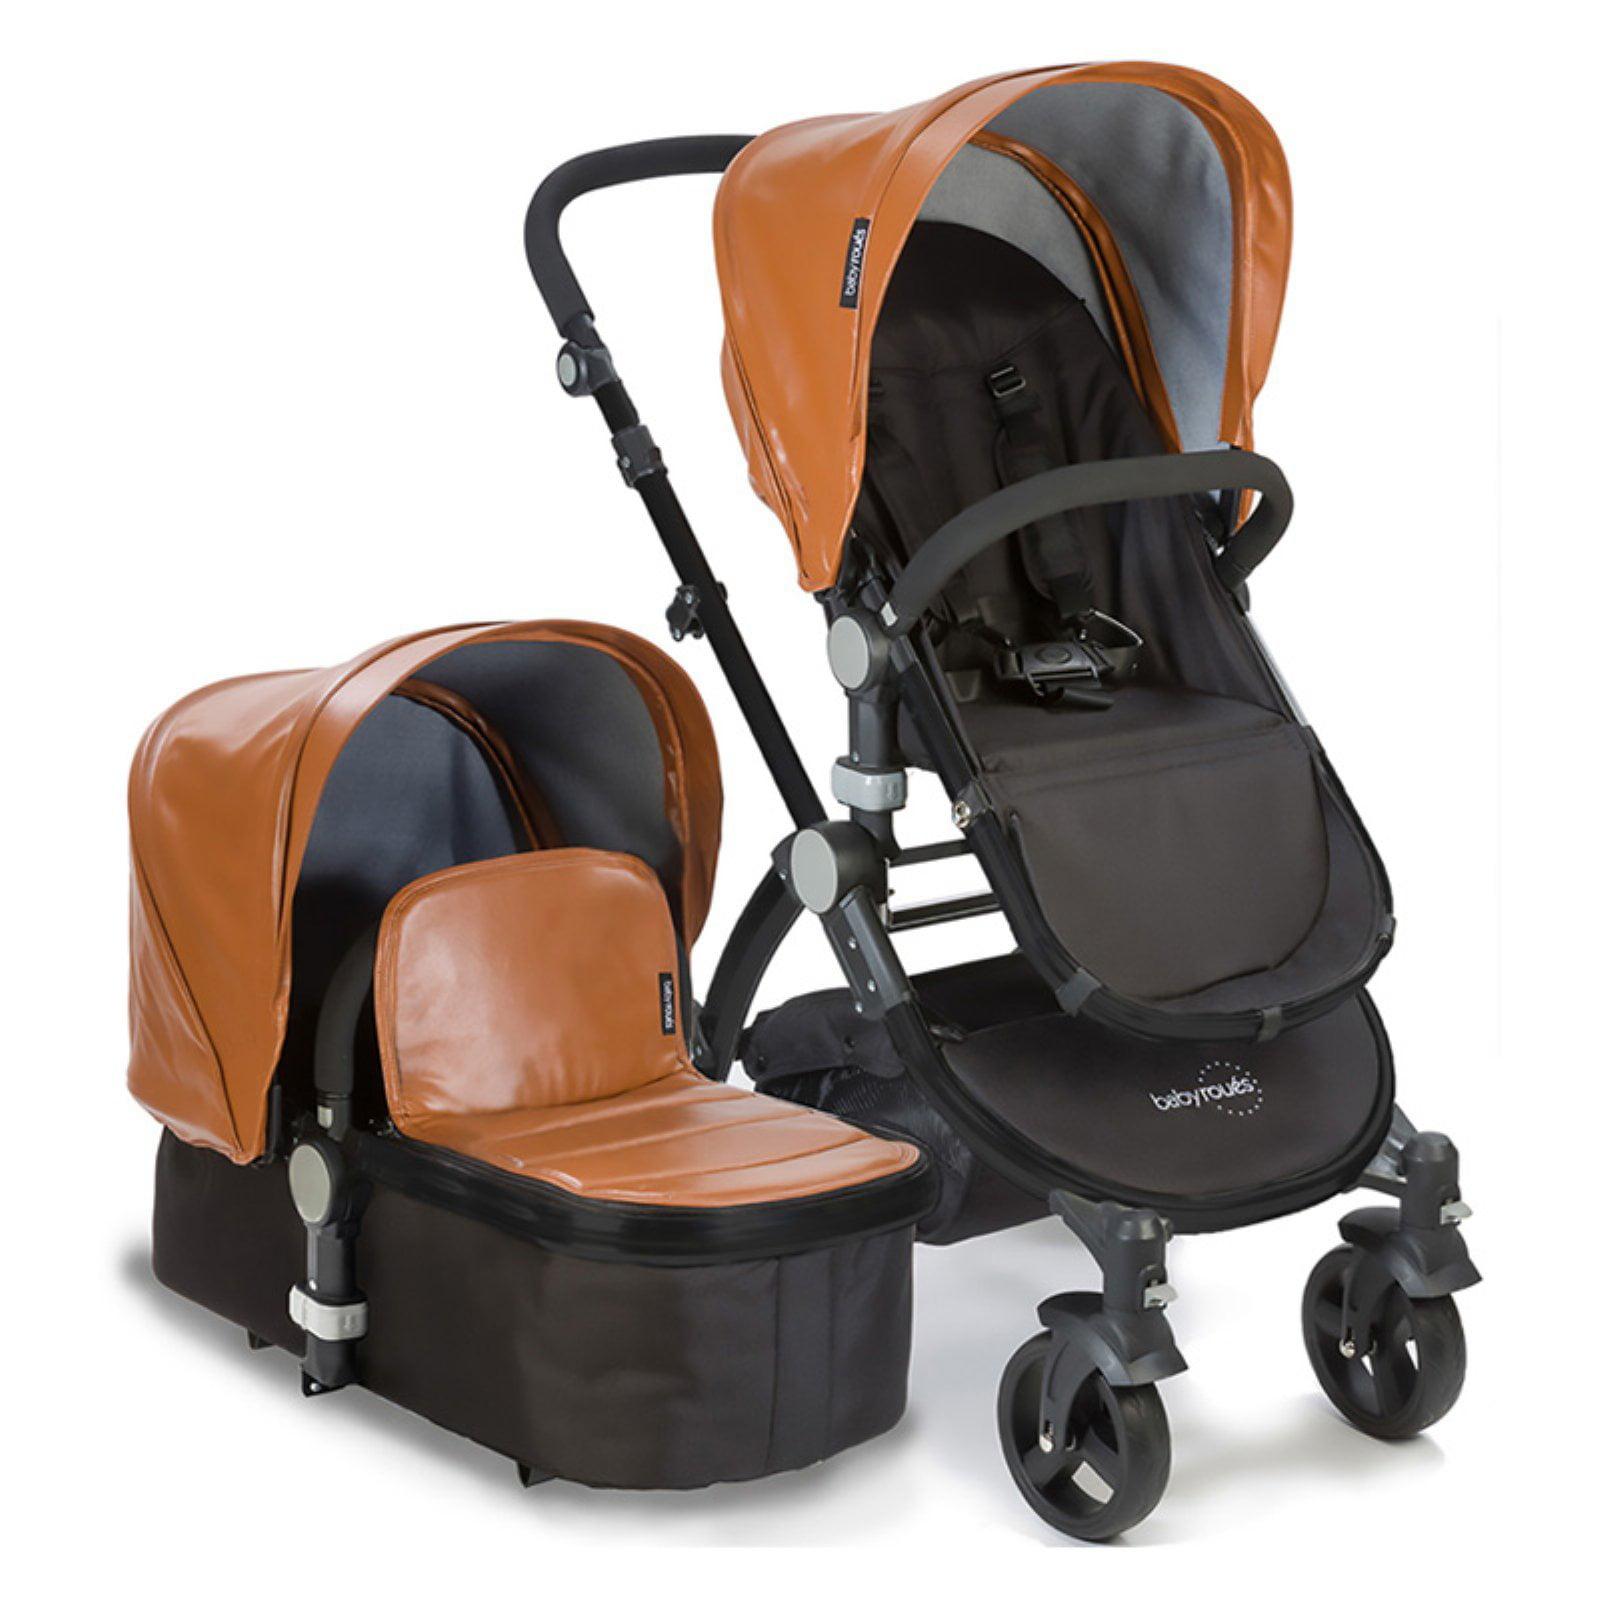 babyroues letour Lux stroller w/basinet black frame camel leathette canopy & footcover